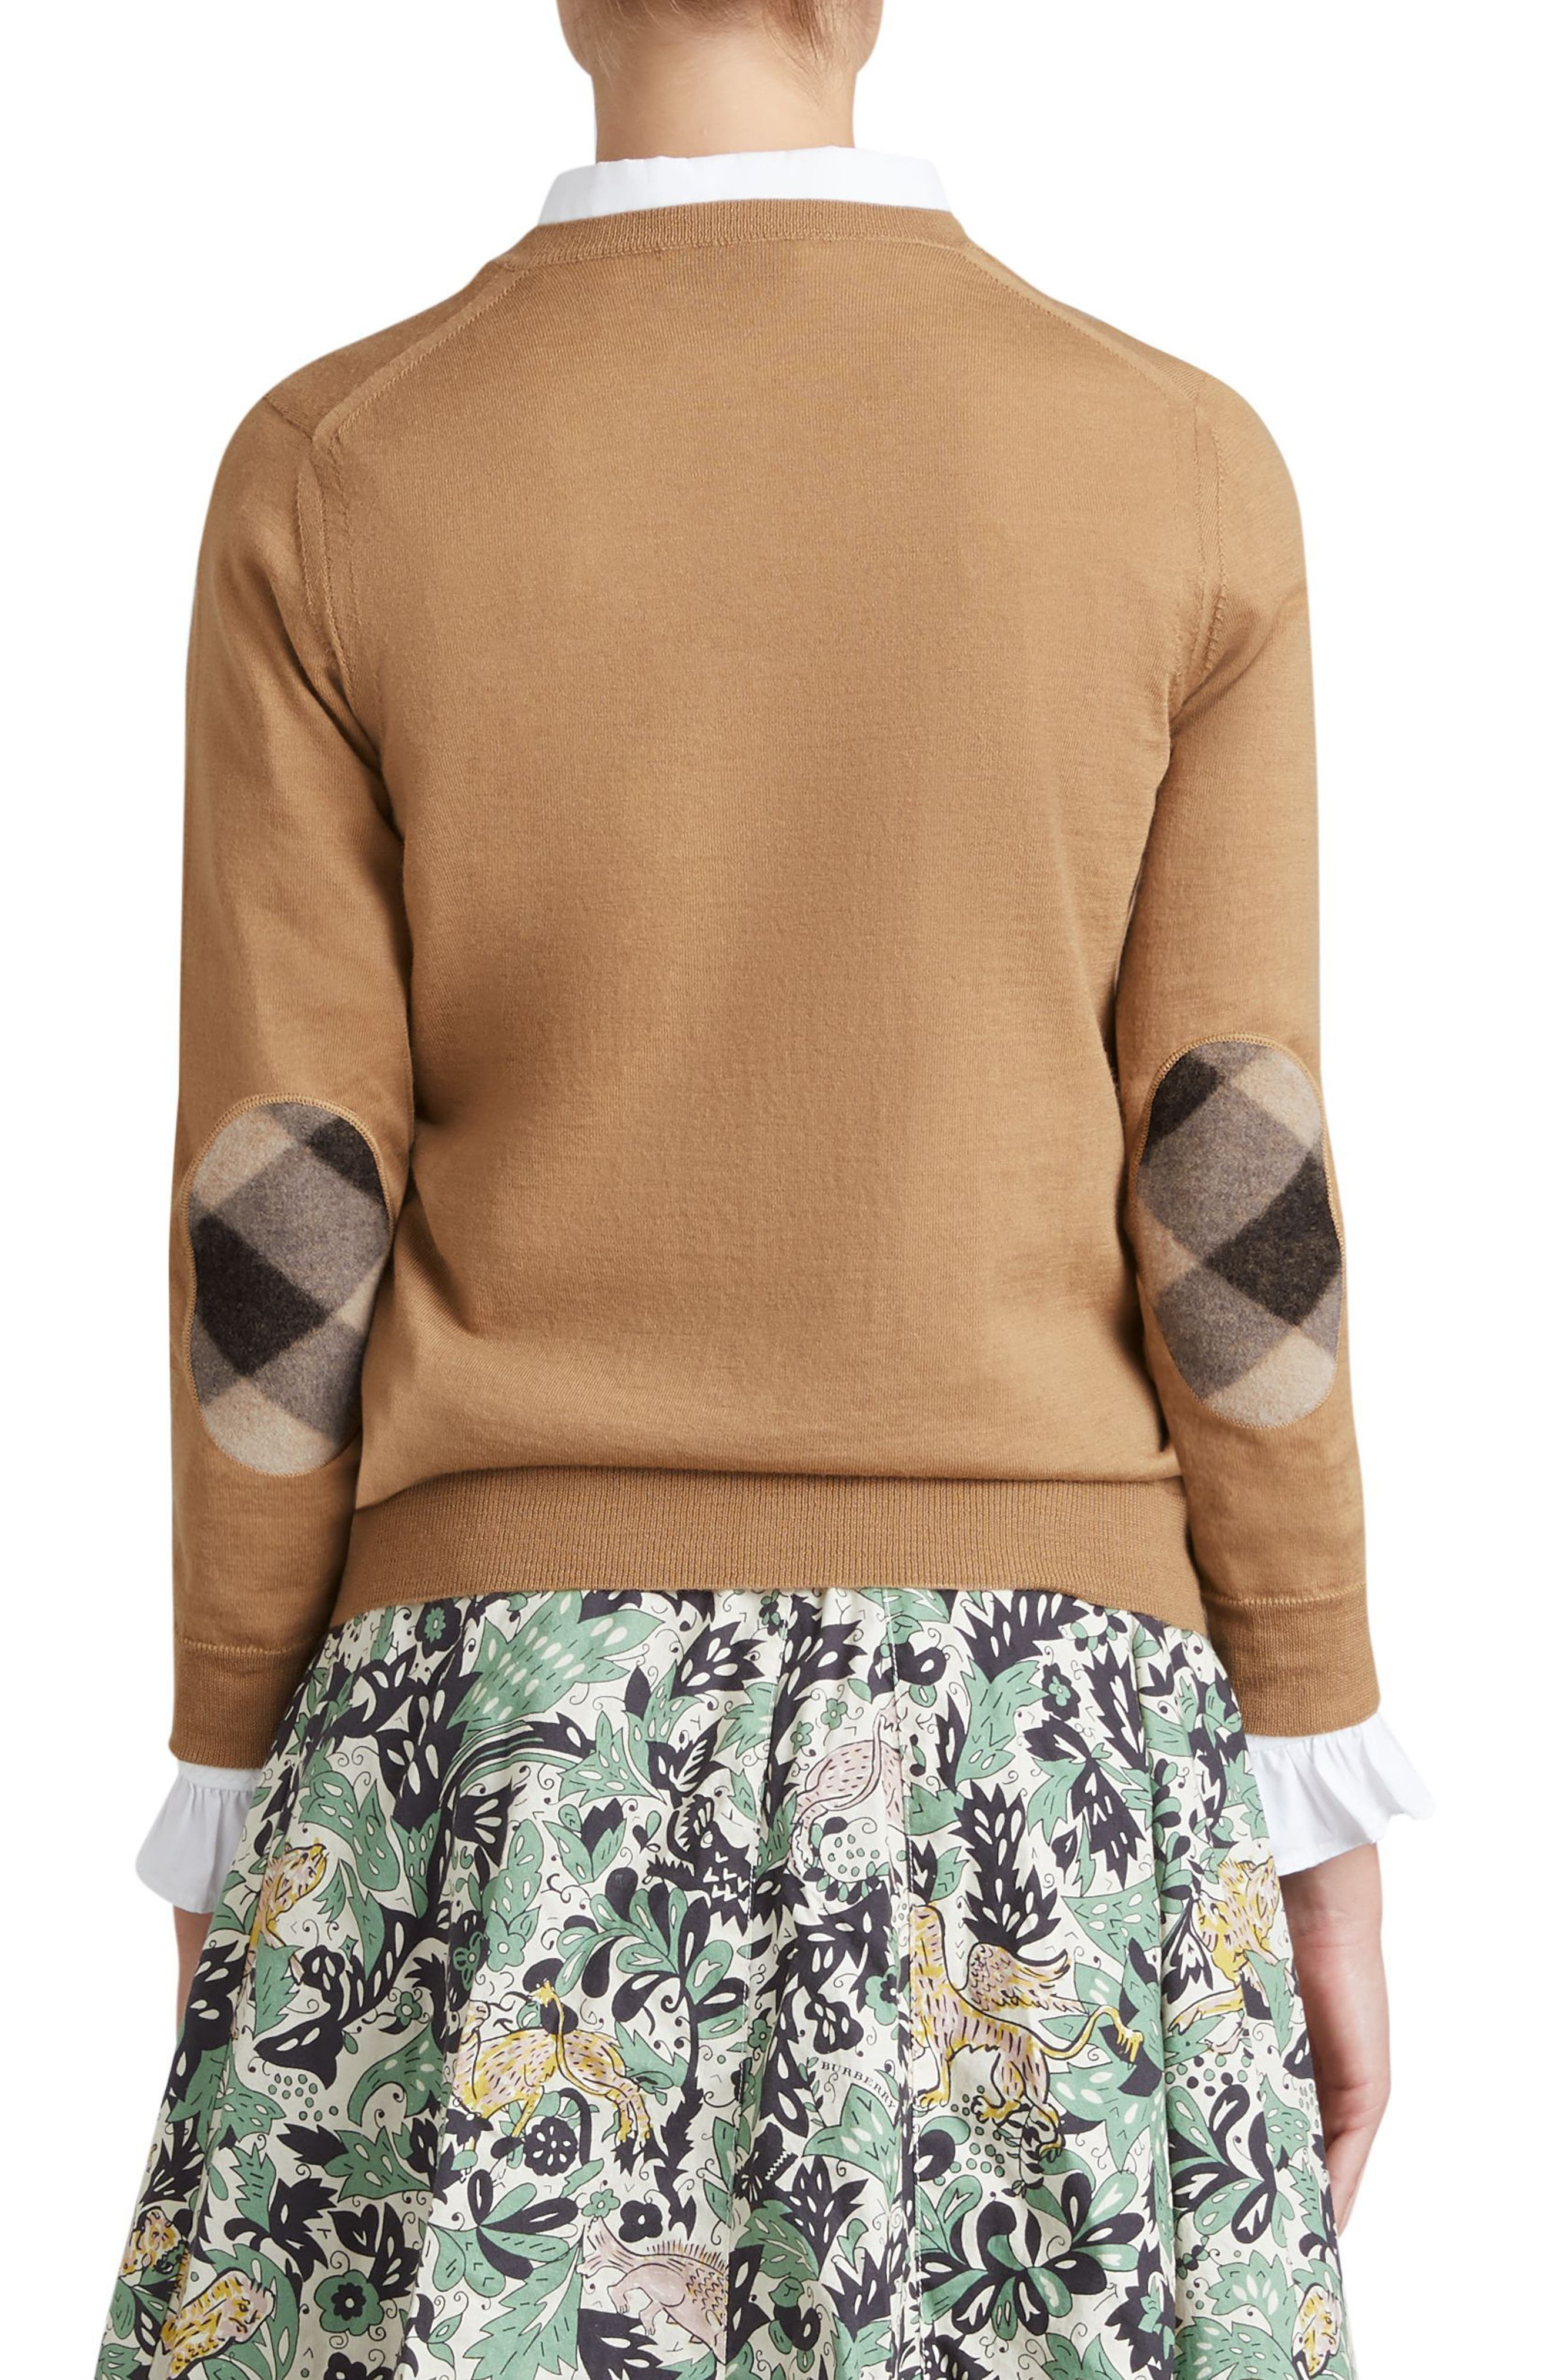 Viar Merino Wool Sweater,                             Alternate thumbnail 9, color,